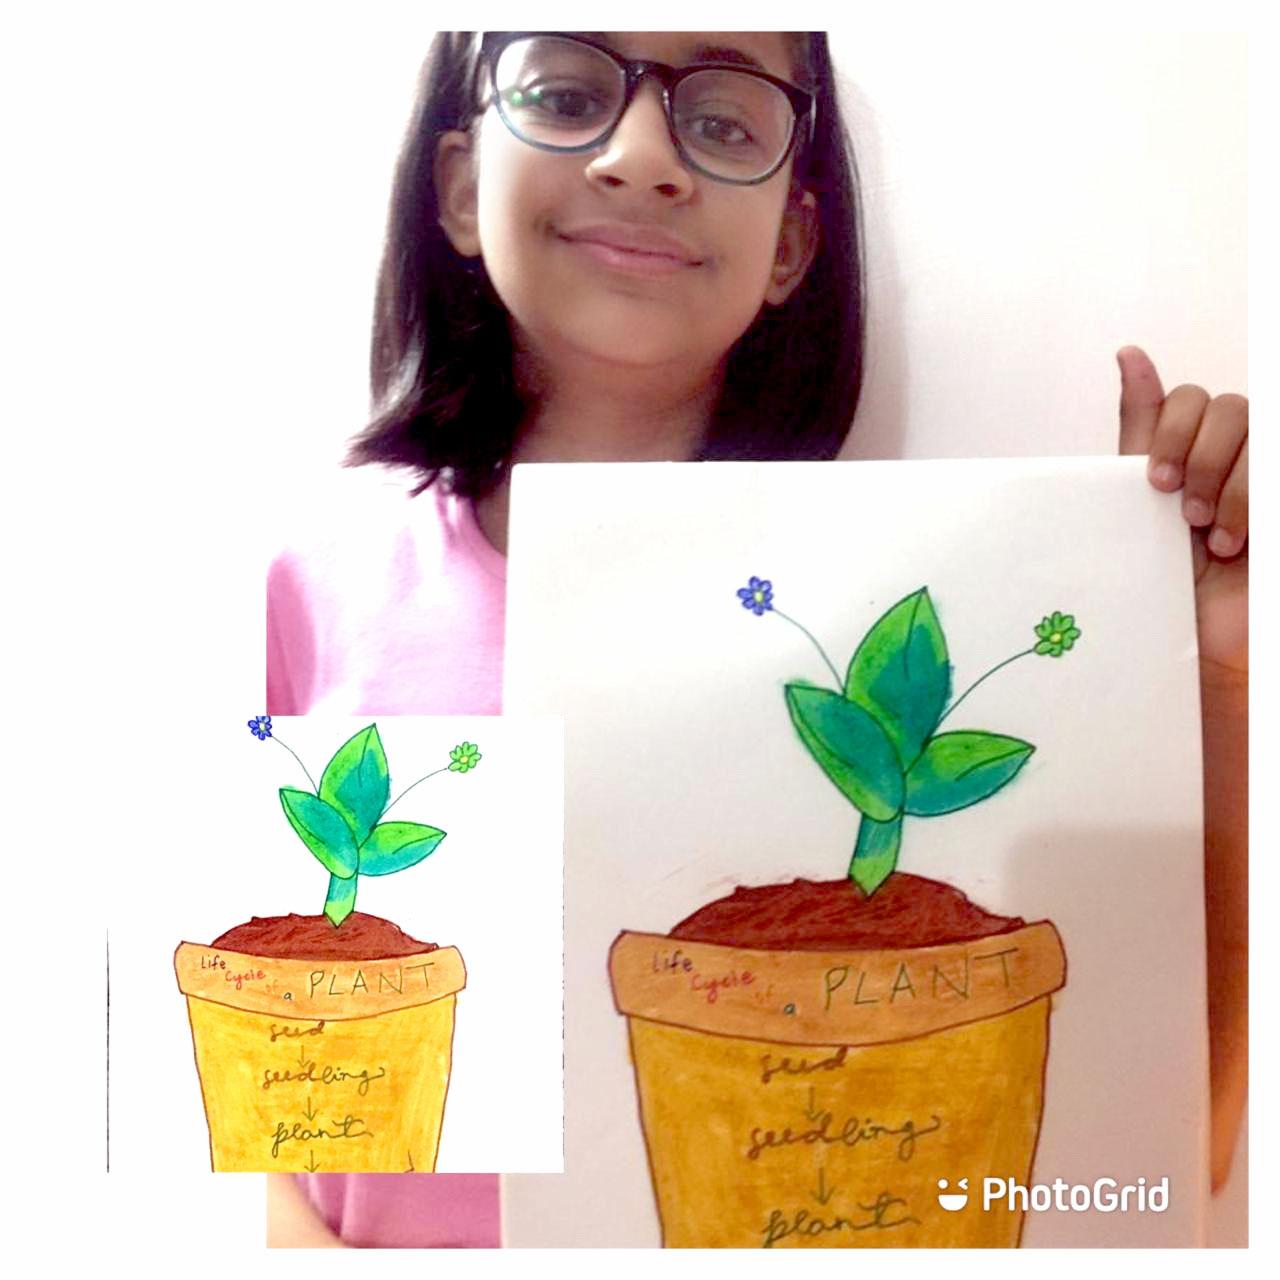 CHARACTERISTICS OF PLANTS 2020